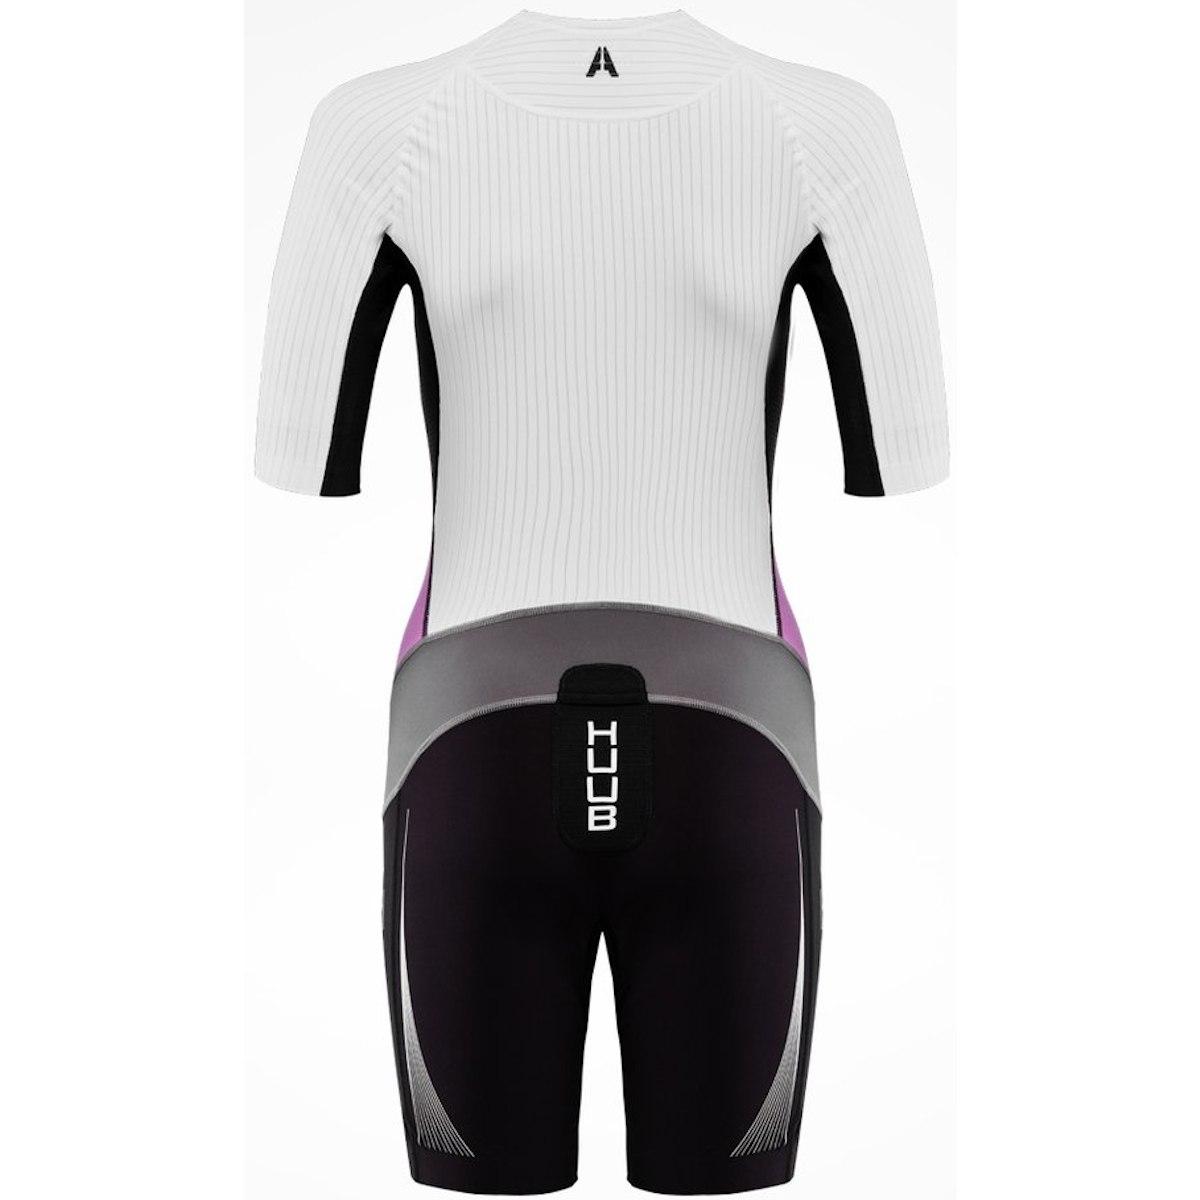 Bild von HUUB Design Anemoi Aero Damen Trisuit - schwarz/lila